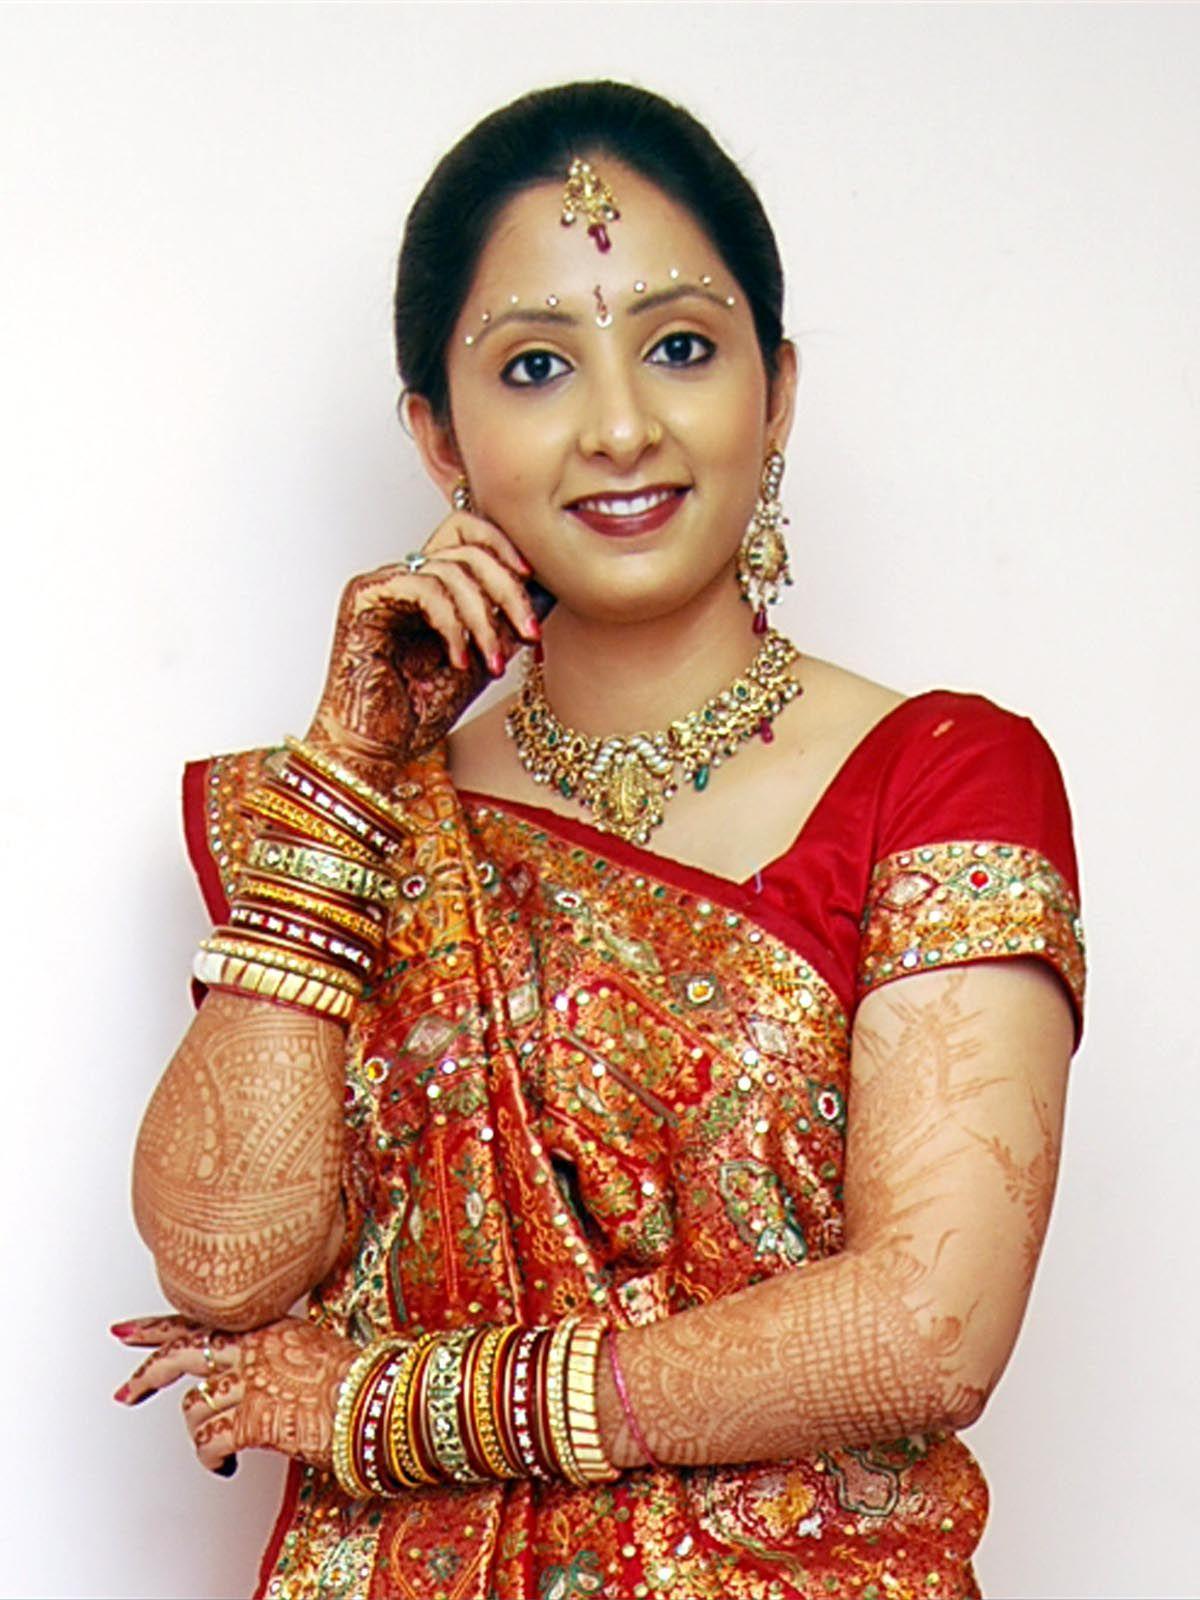 Indian dresses | Indian wedding dress | Wedding dress | Dresses - My ...